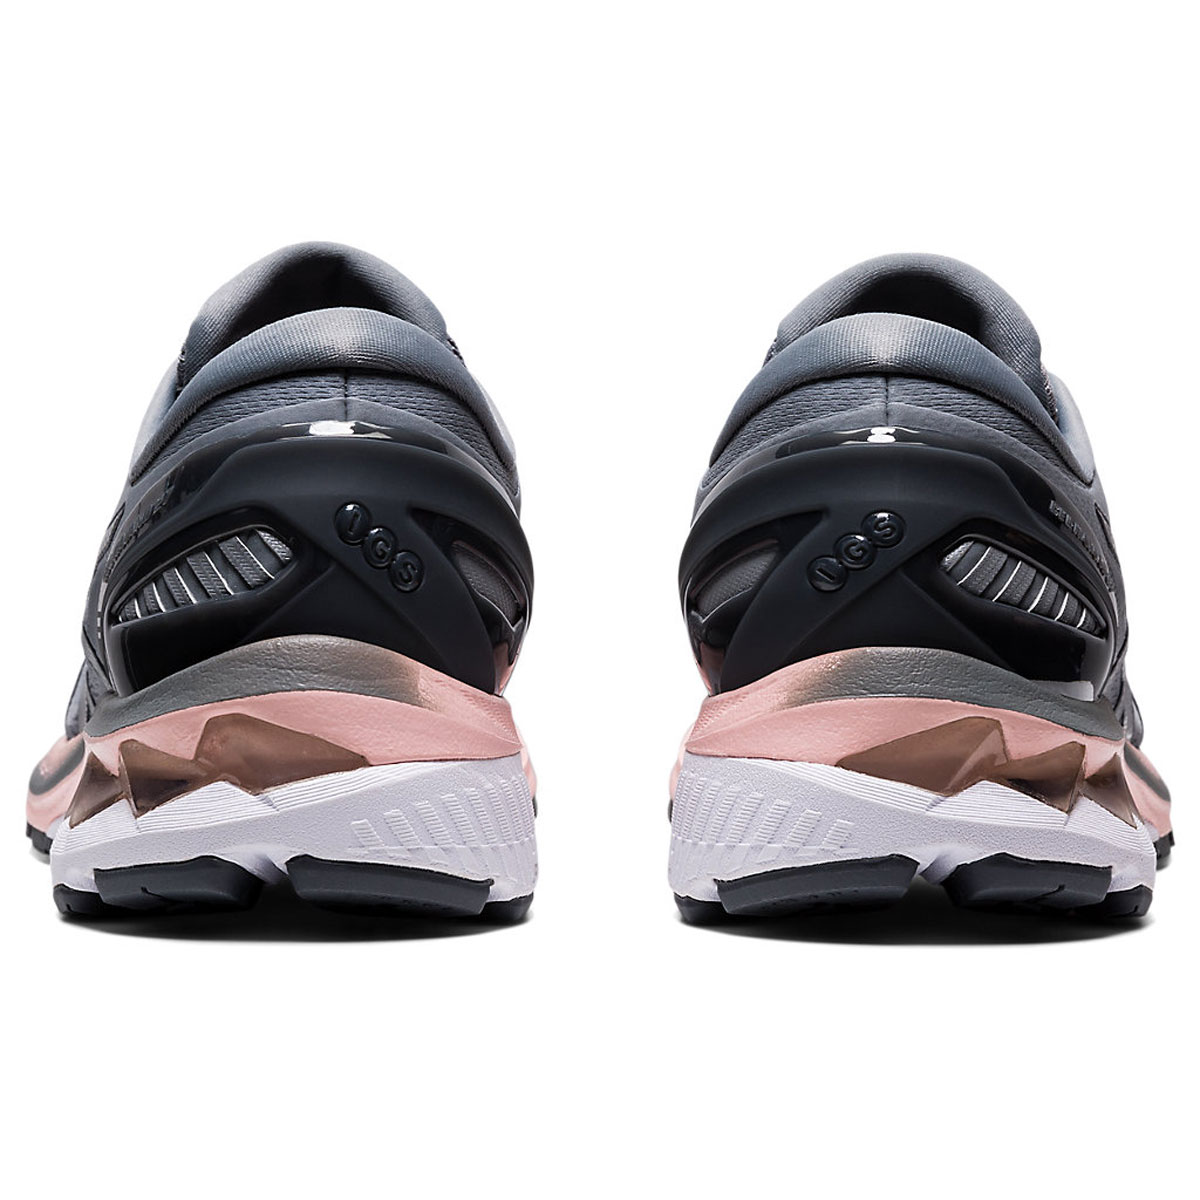 Women's Asics GEL-Kayano 27 Running Shoe - Color: Sheet Rock/Pure (Regular Width) - Size: 5, Sheet Rock/Pure, large, image 5